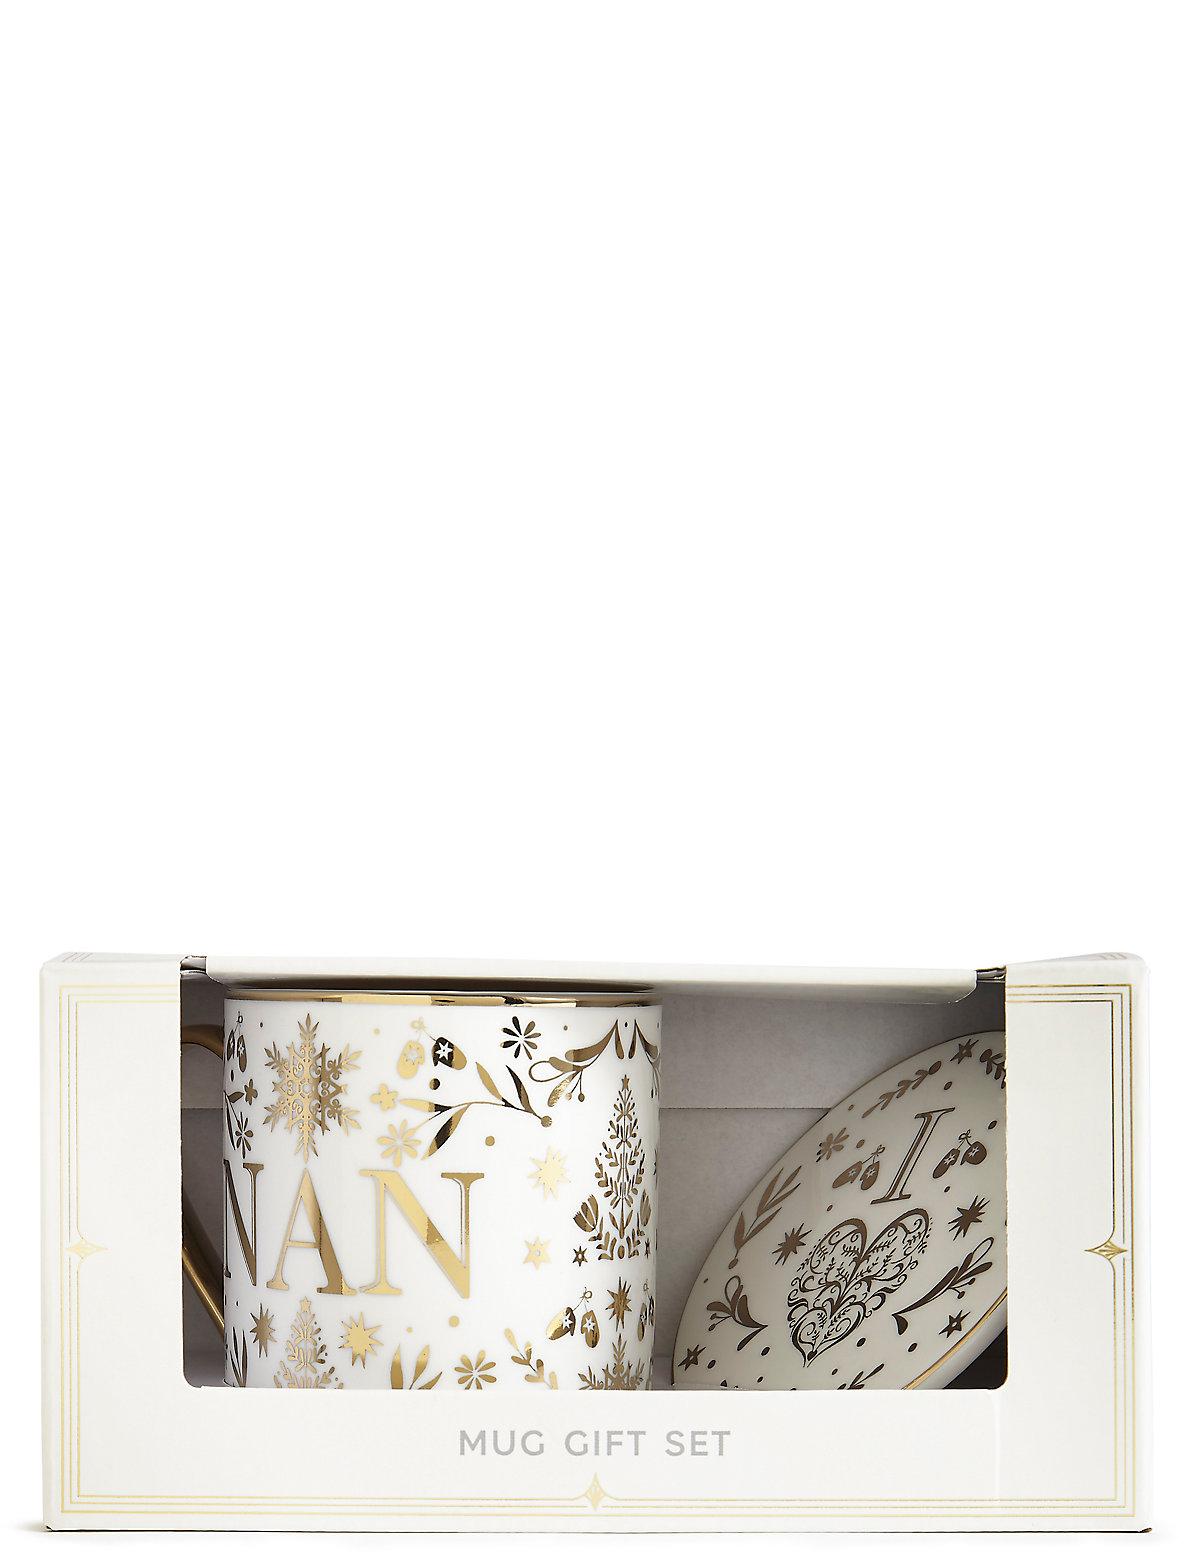 Nan Mug & Coaster Gift Set